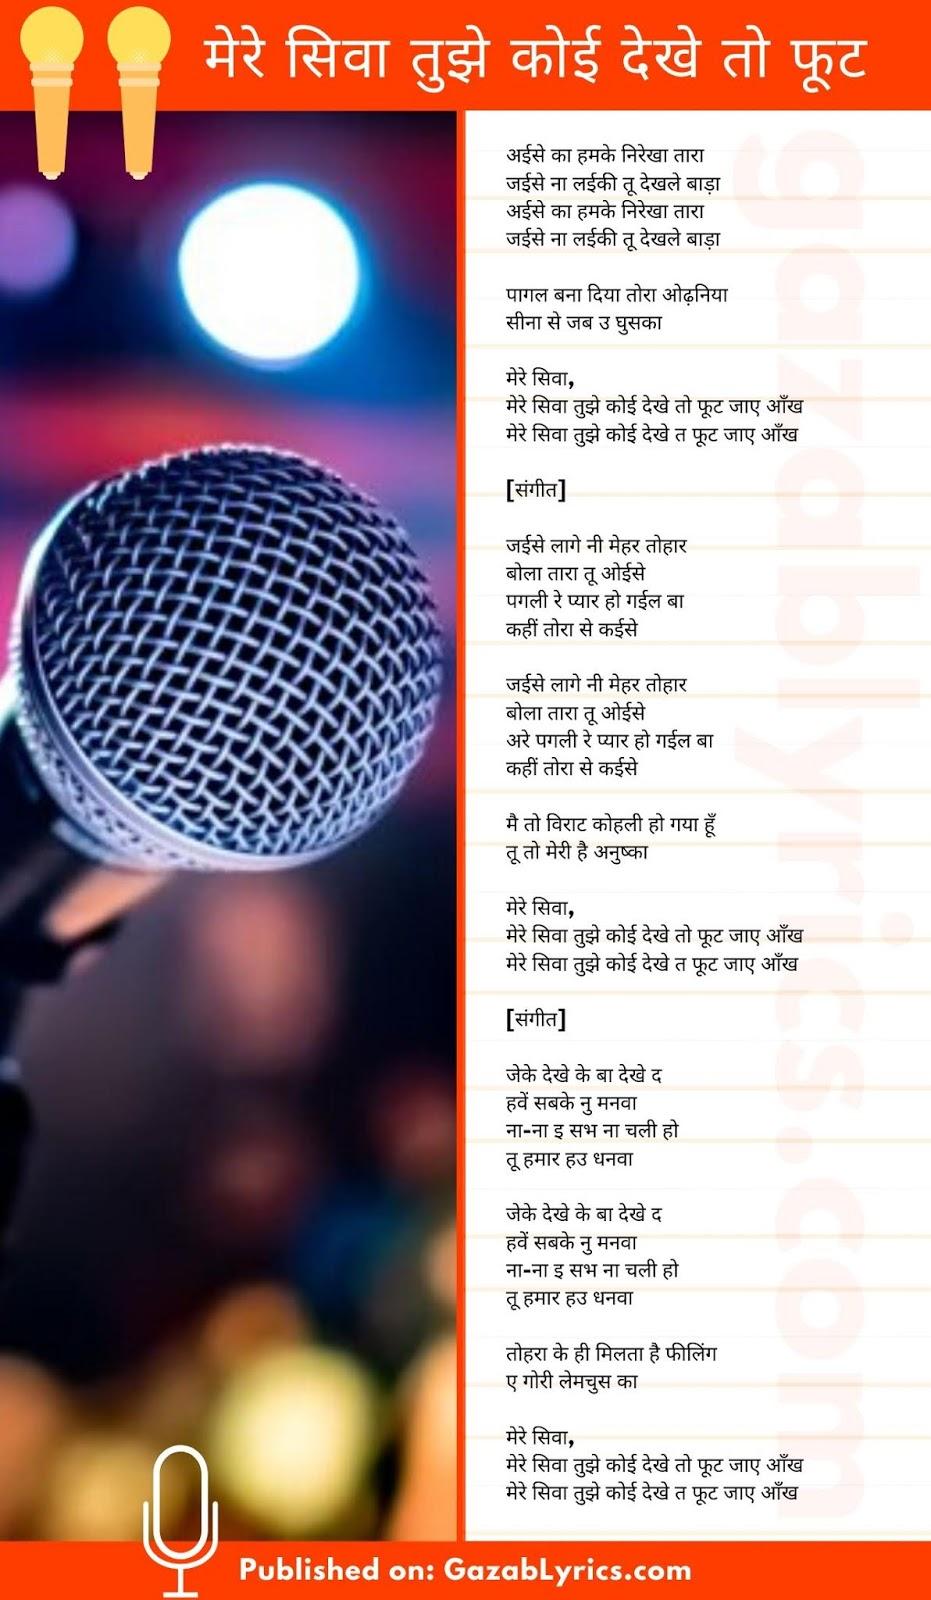 Mere Siva Tujhe Koi Dekhe To Foot Jaye Ankh song lyrics image